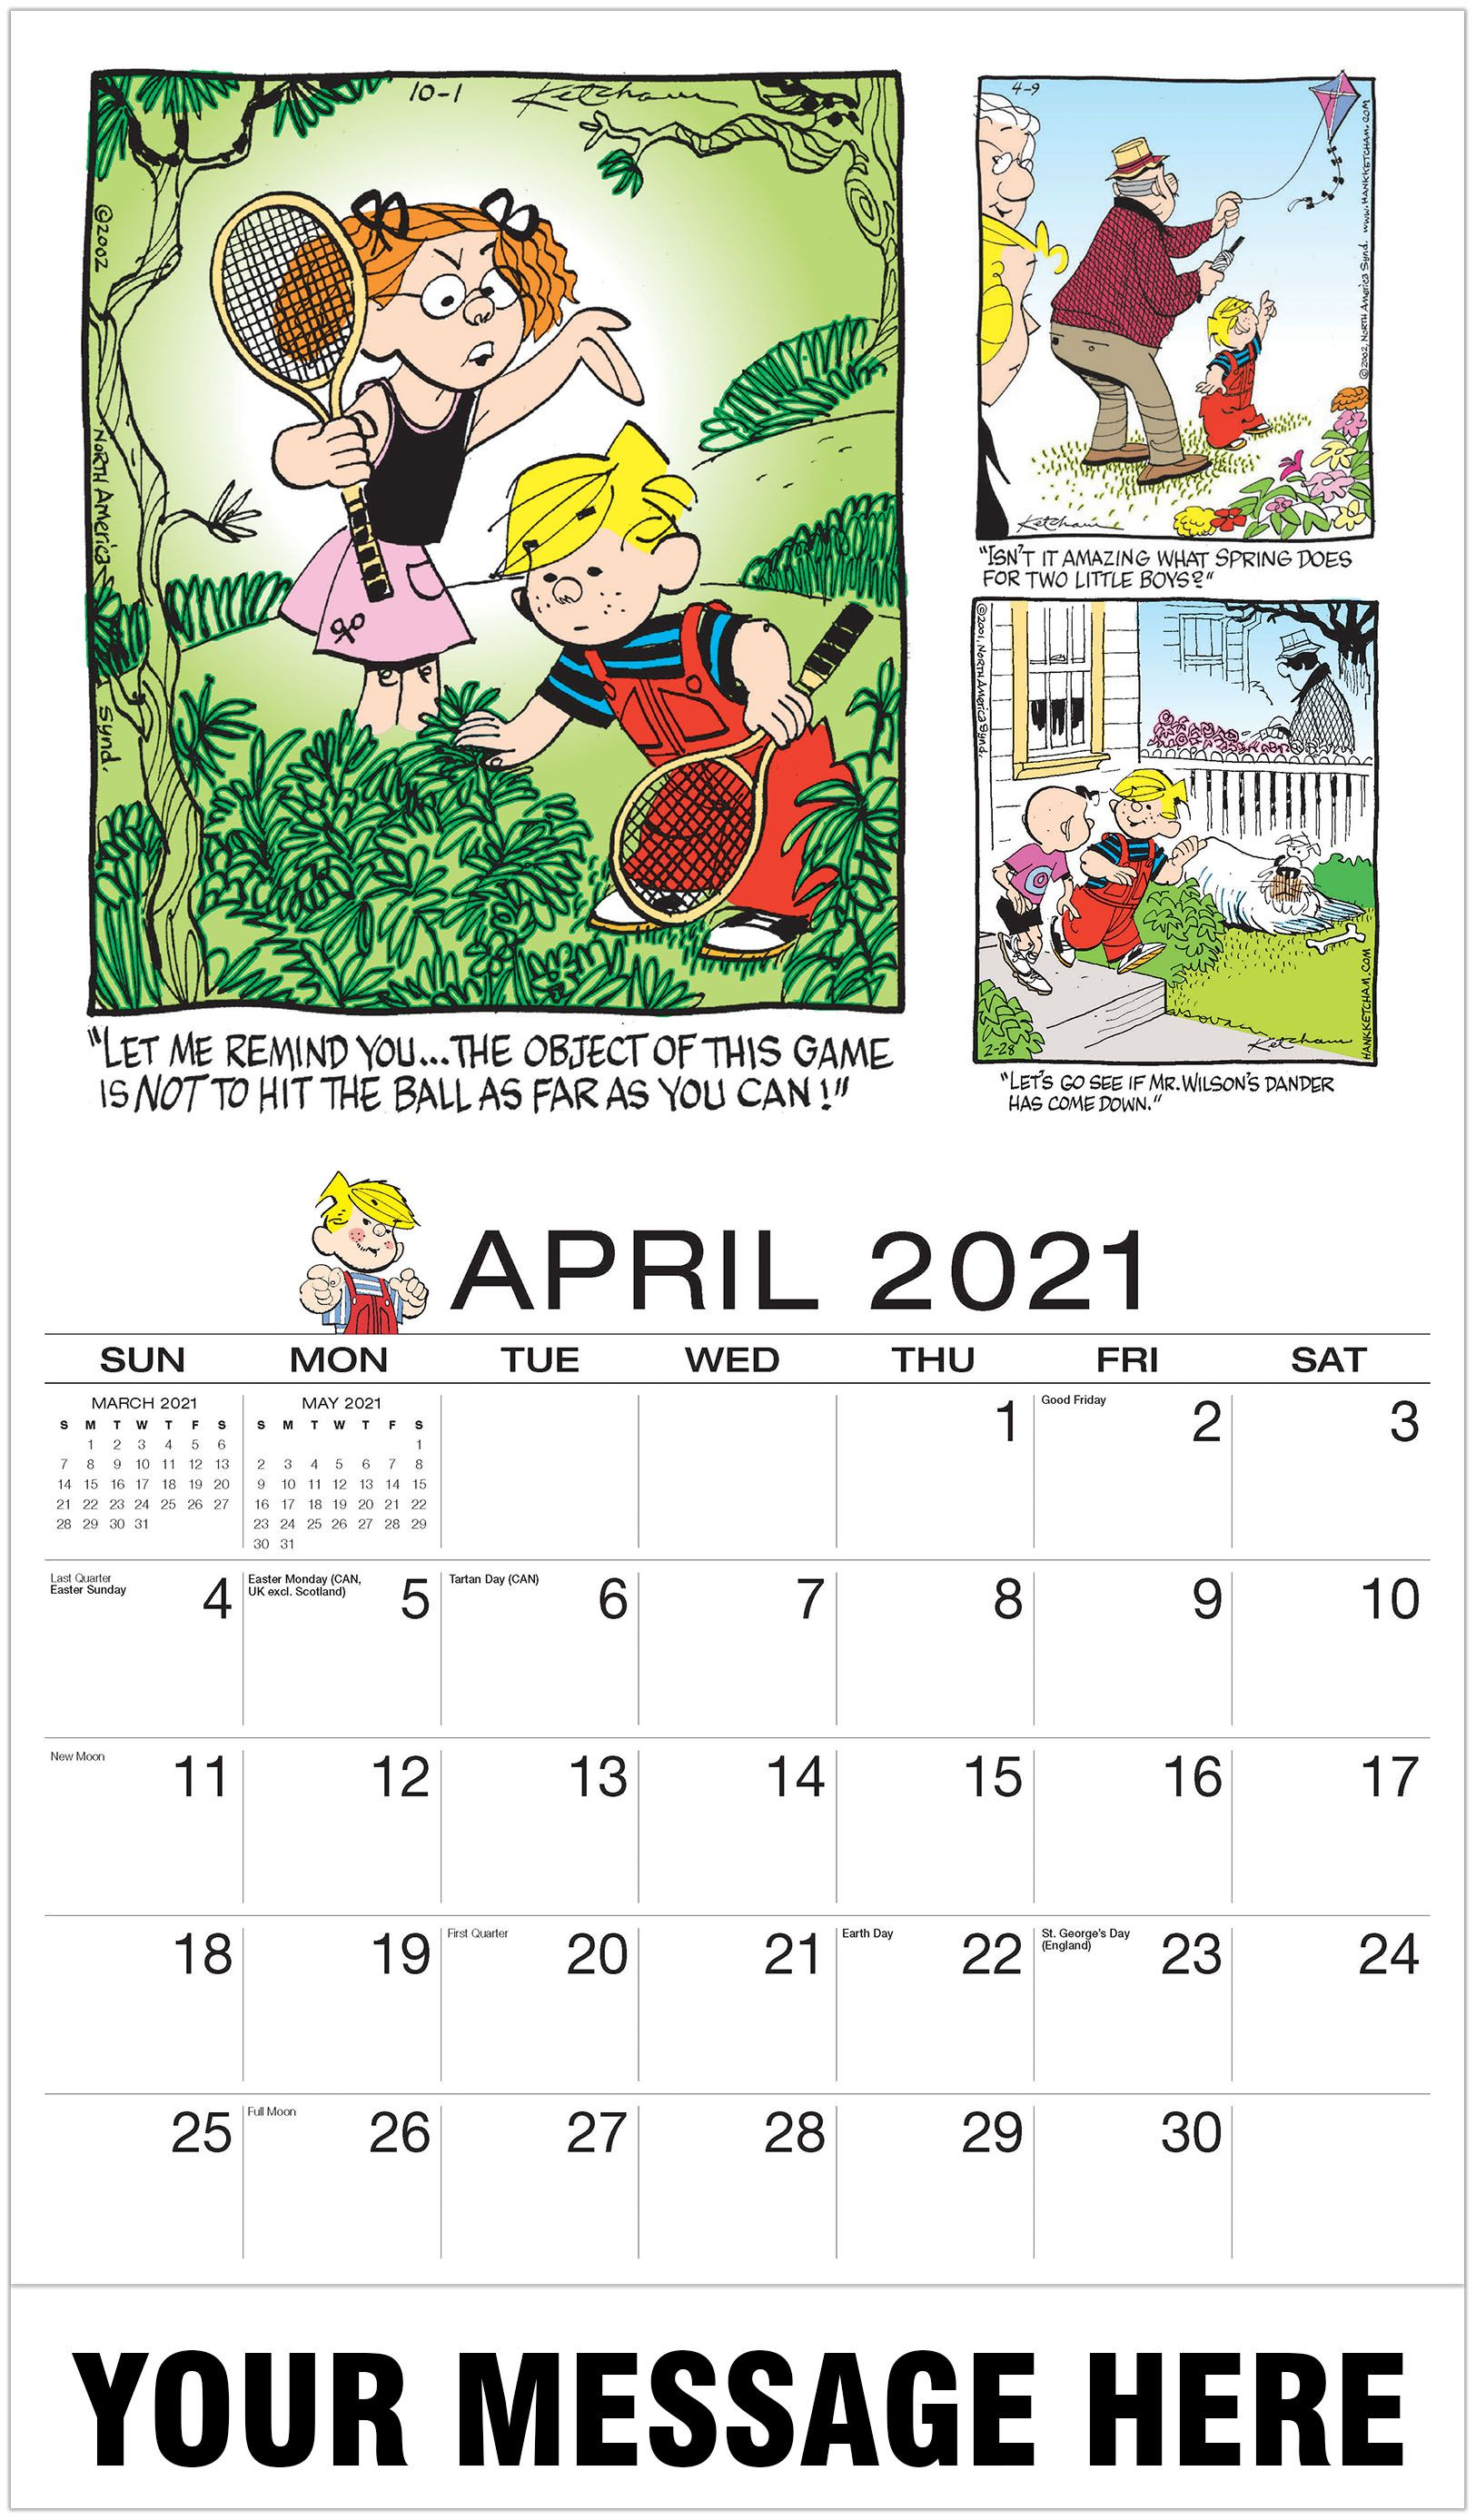 2021 Promotional Calendar Dennis The Menacecomic Art Calendar April2021 Dennis The Menace Art Calendar In 2020 Dennis The Menace Art Calendar Advertising Calendar